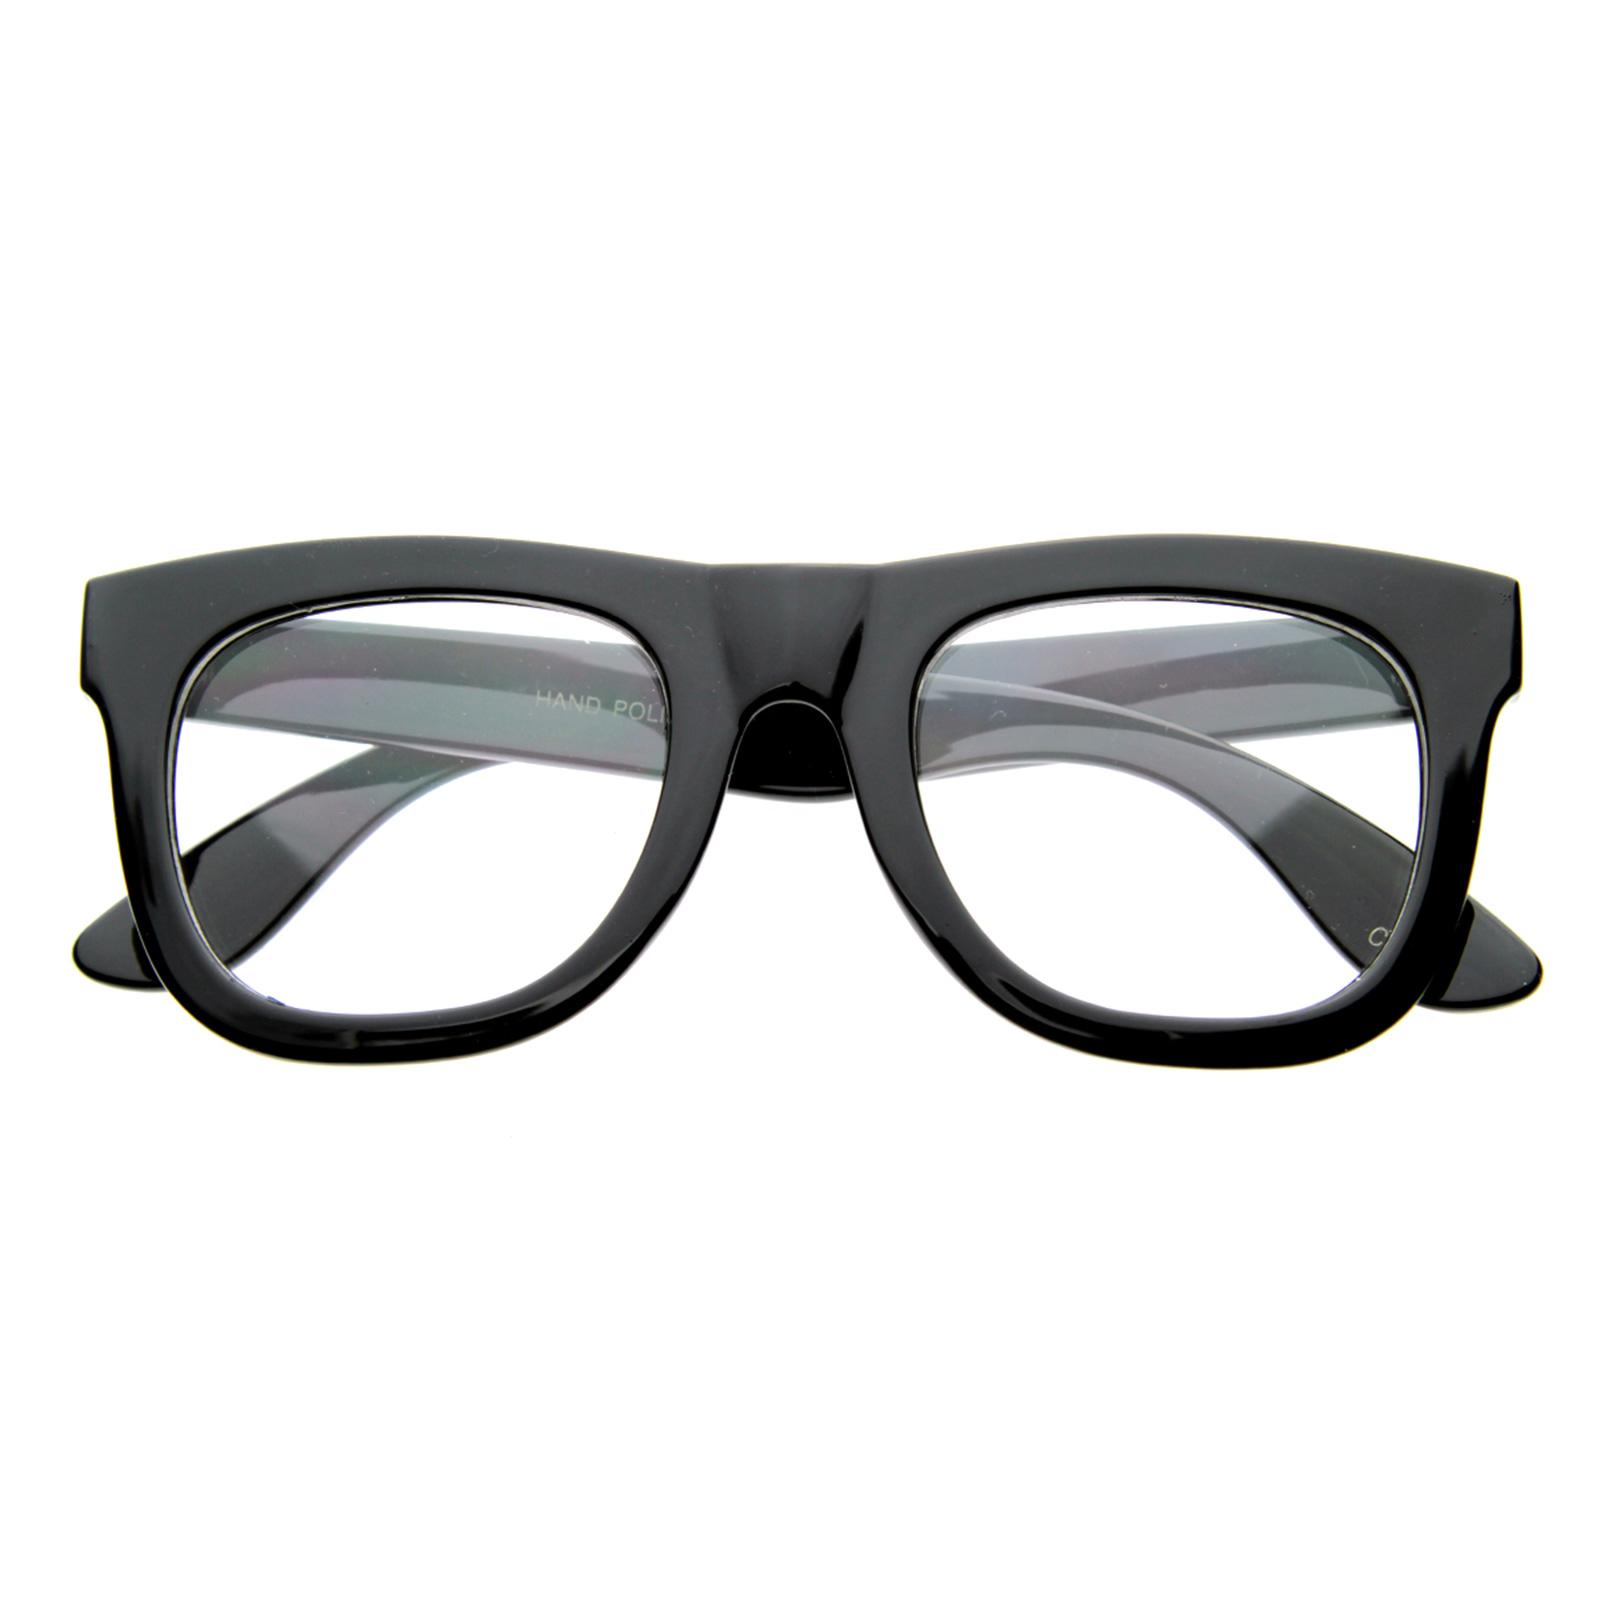 CLEAR LENS Retro EMO Thick Wayfarer Glasses 8084 BLACK